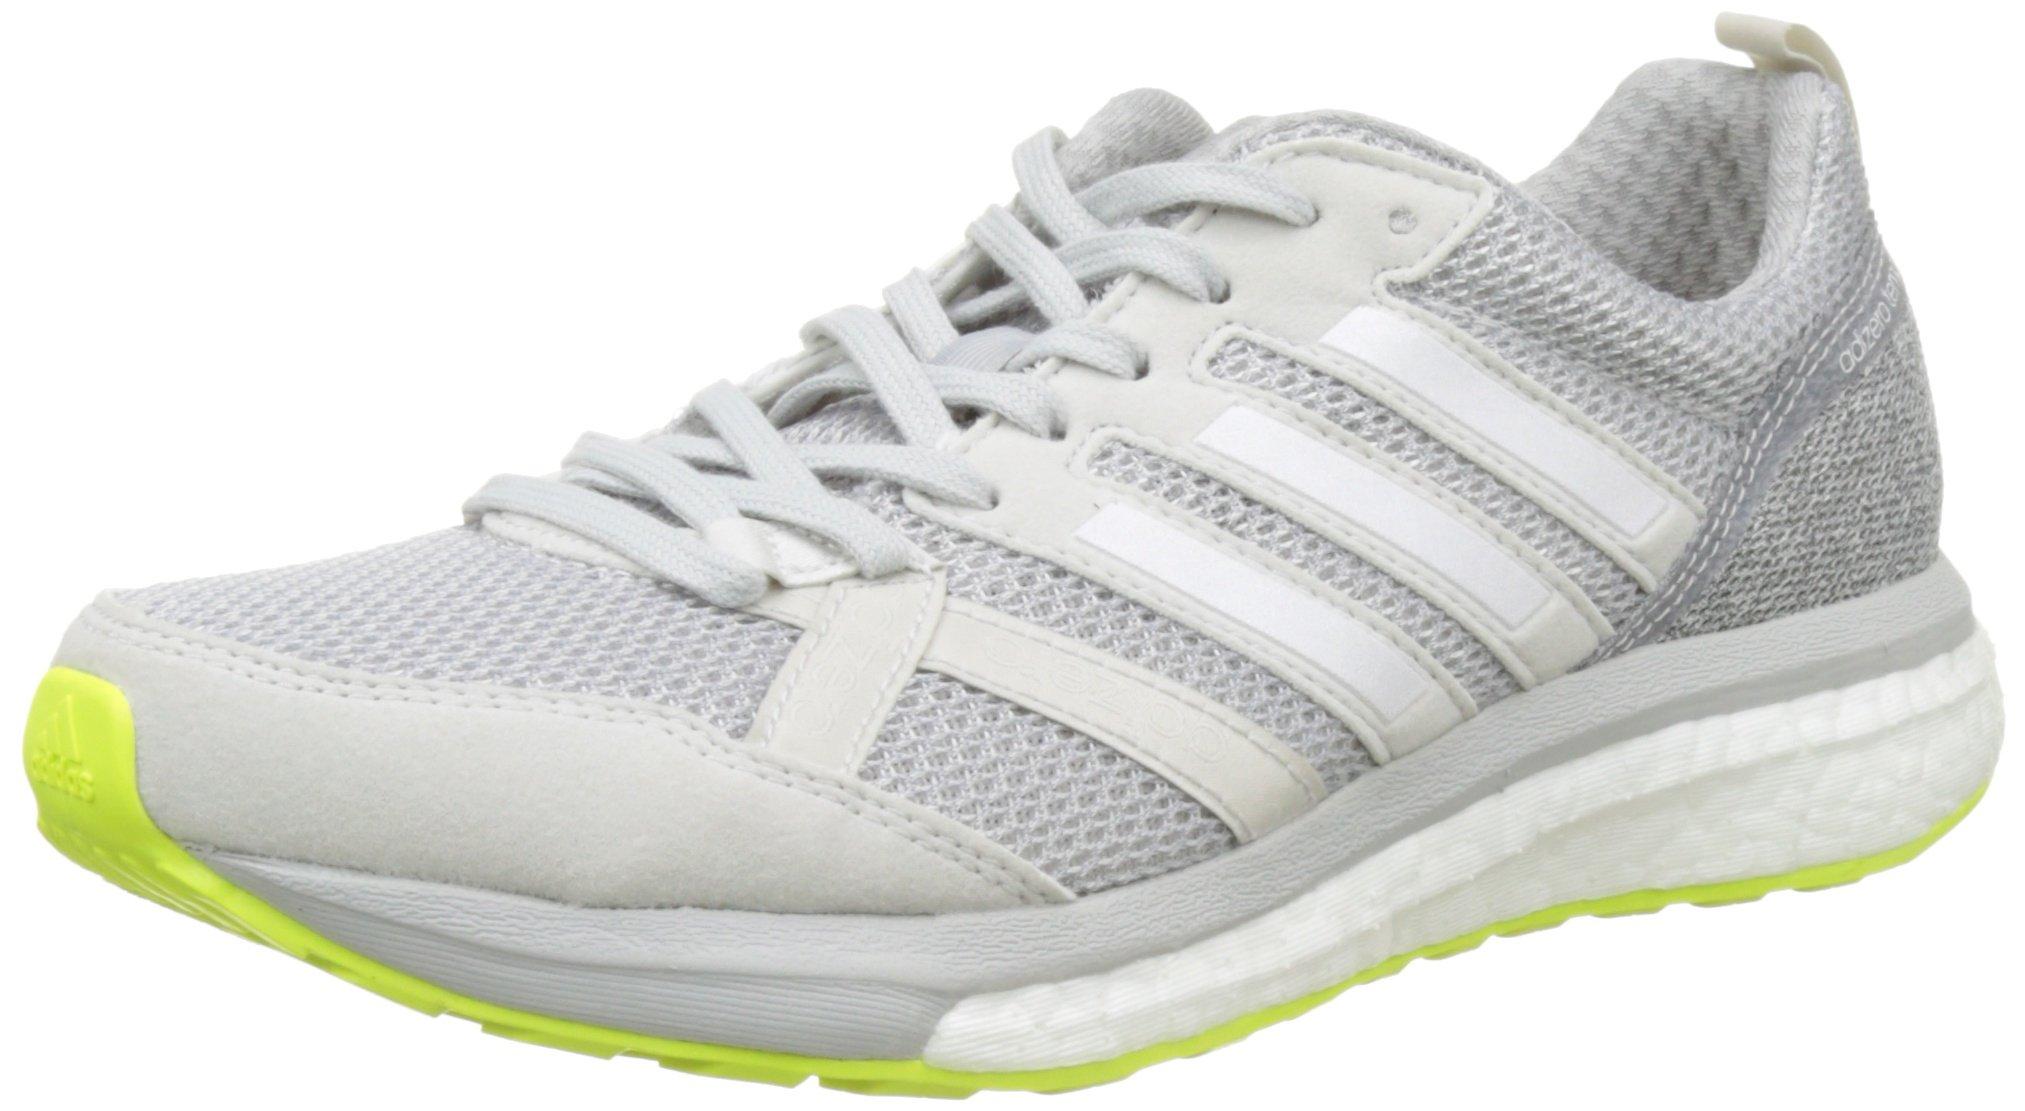 adidas women's adizero tempo 8 running shoes